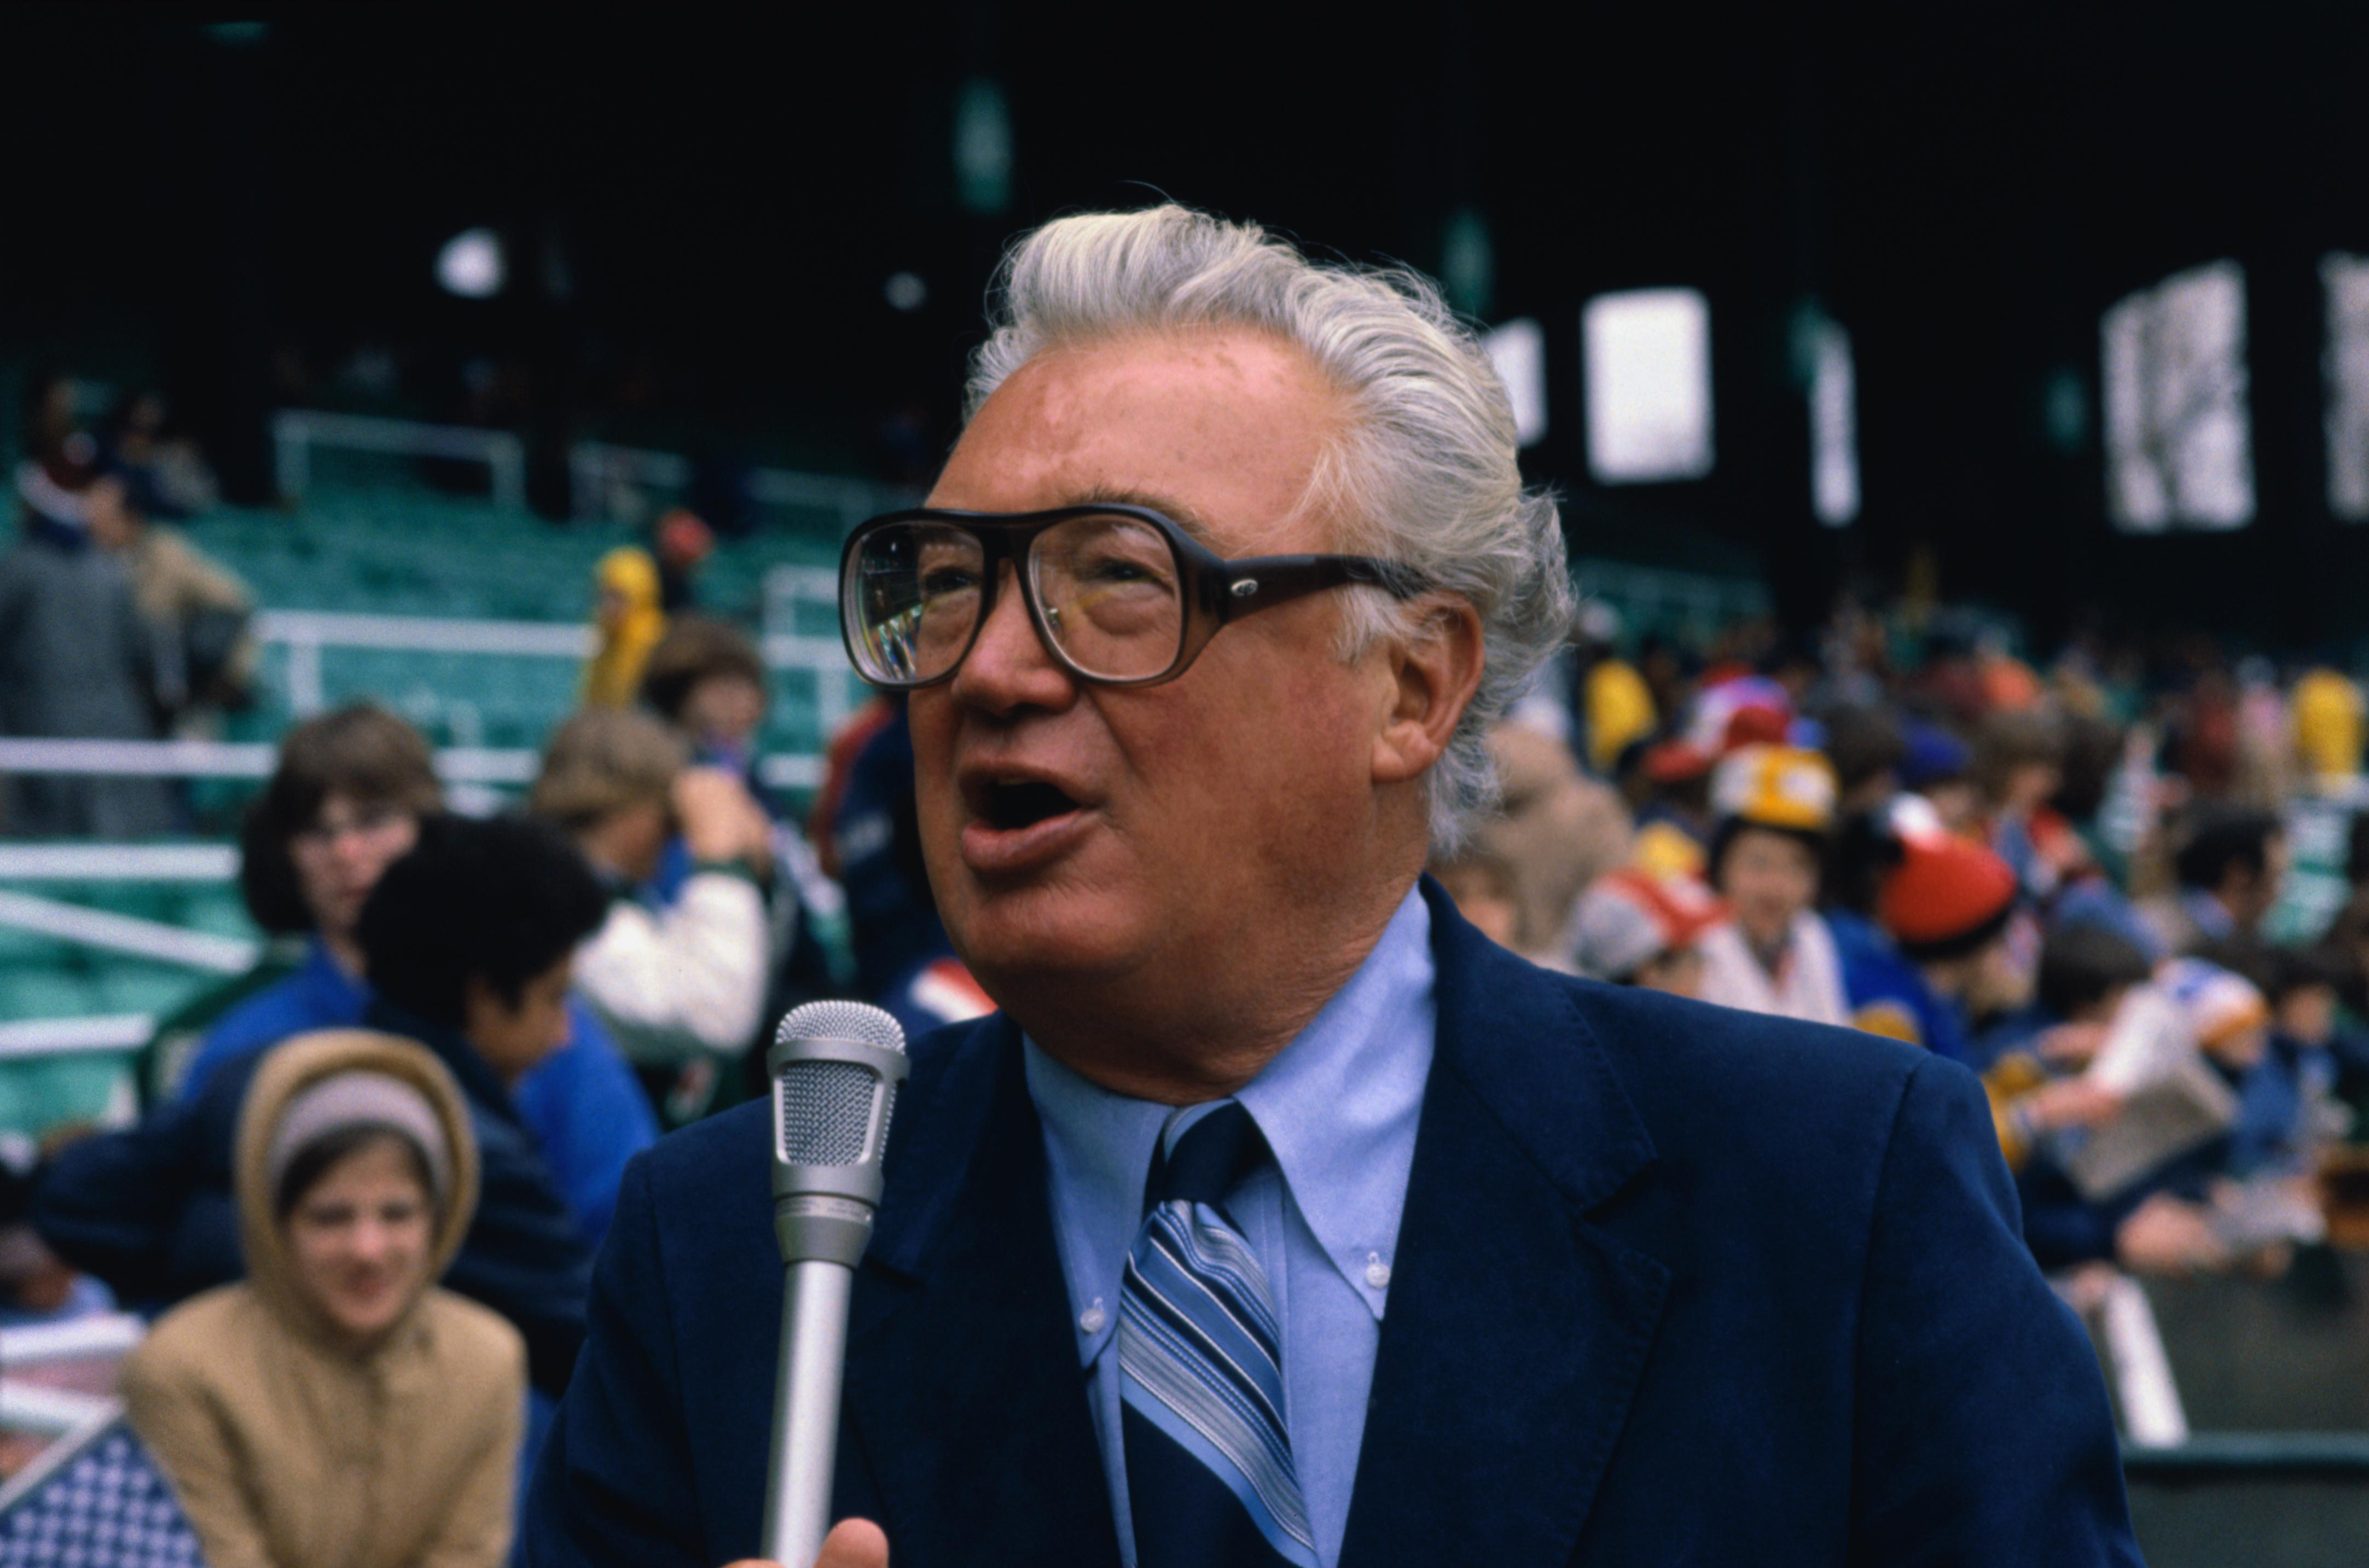 Sportscaster Harry Caray Announcing Baseball Game